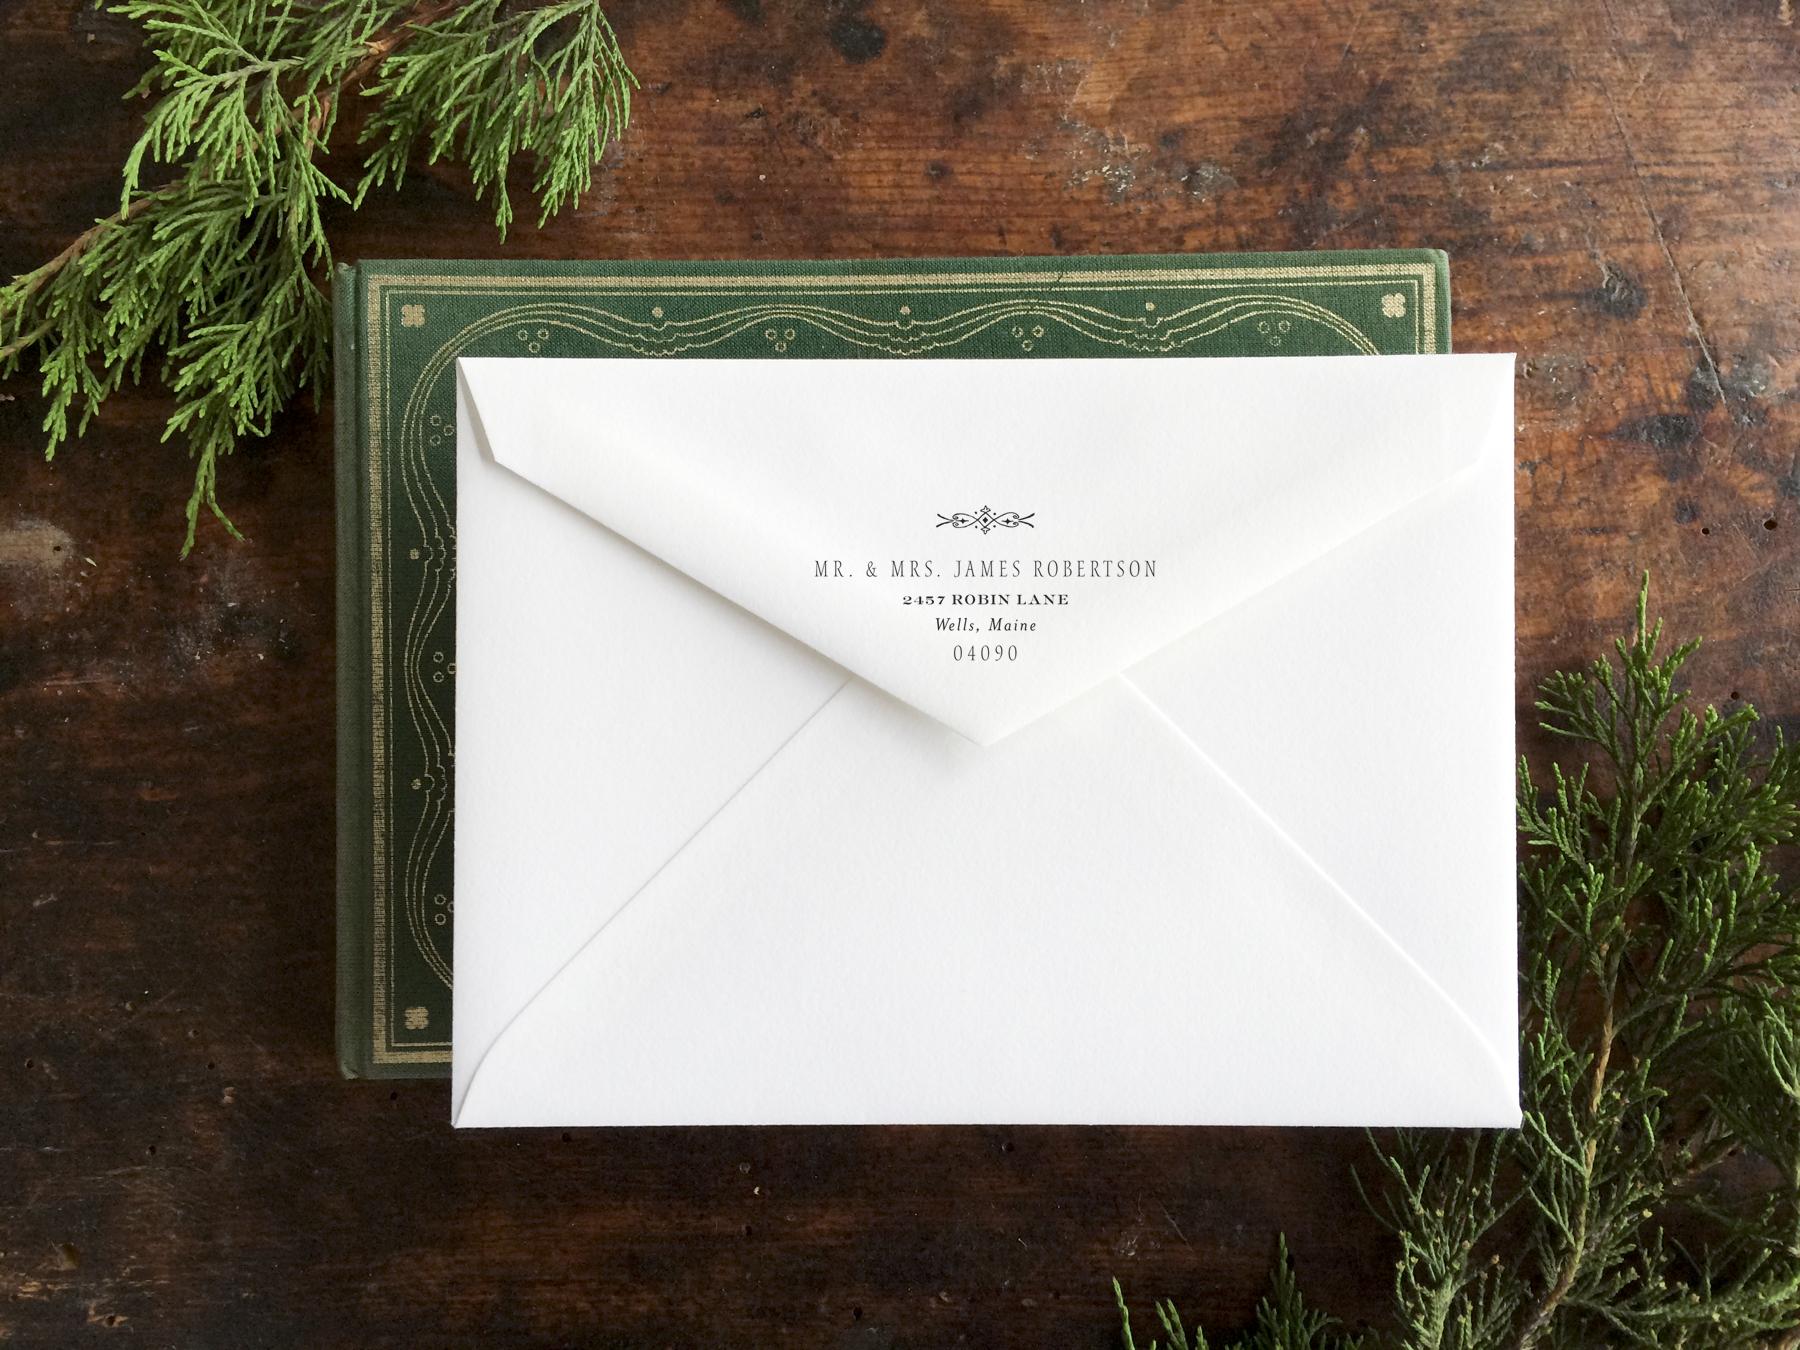 vintage-returnaddress-envelope.jpg